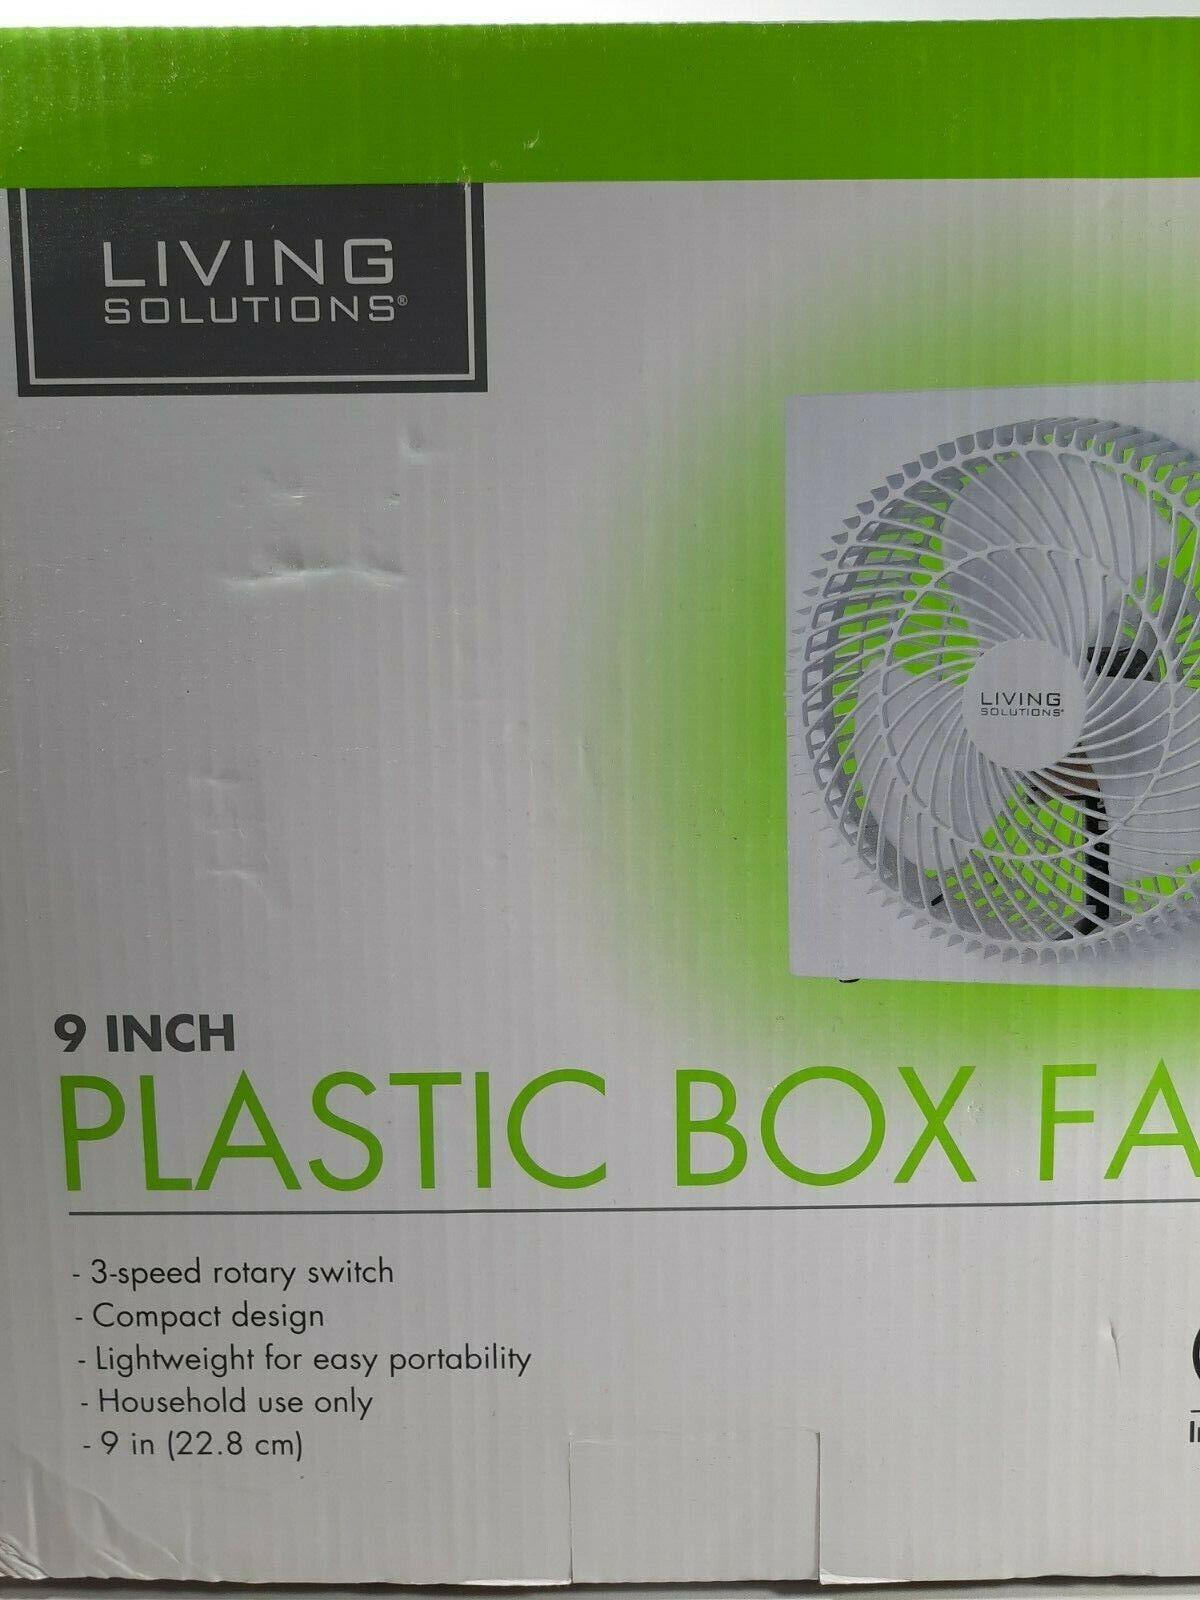 9inch plastic box fan new